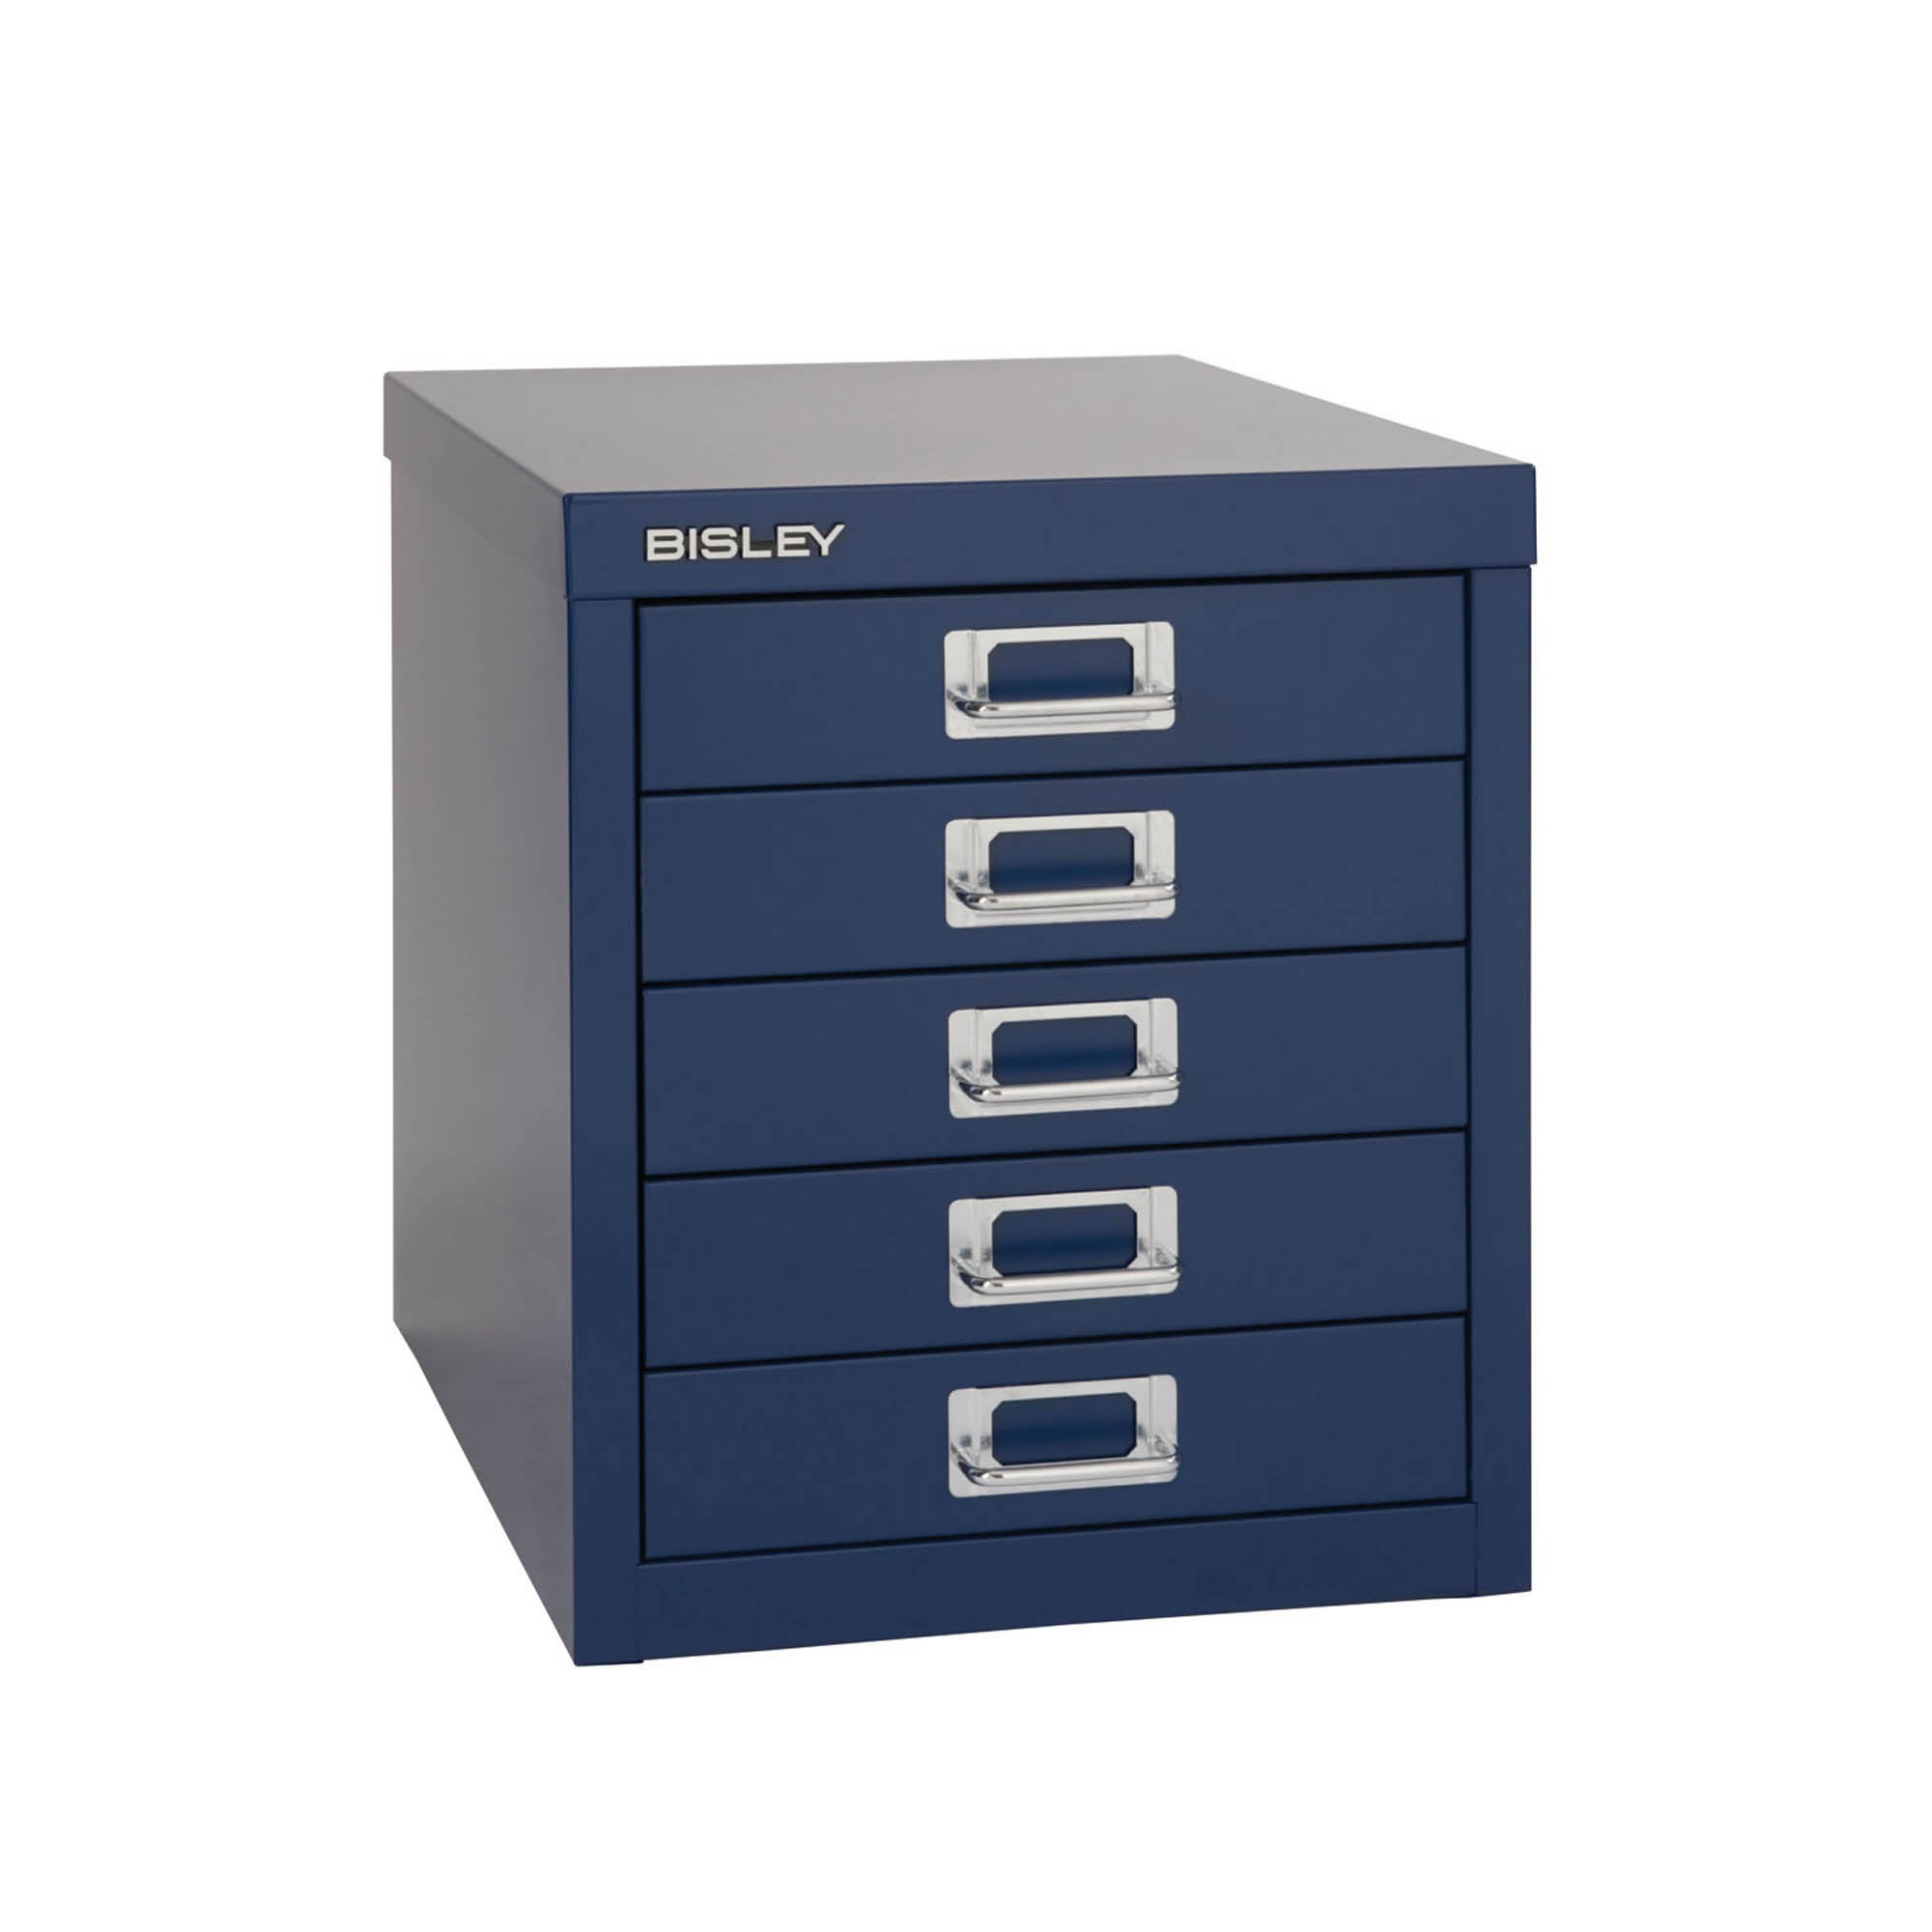 Bisley Metal 5 Drawer Filing Cabinet Navy (Blue)